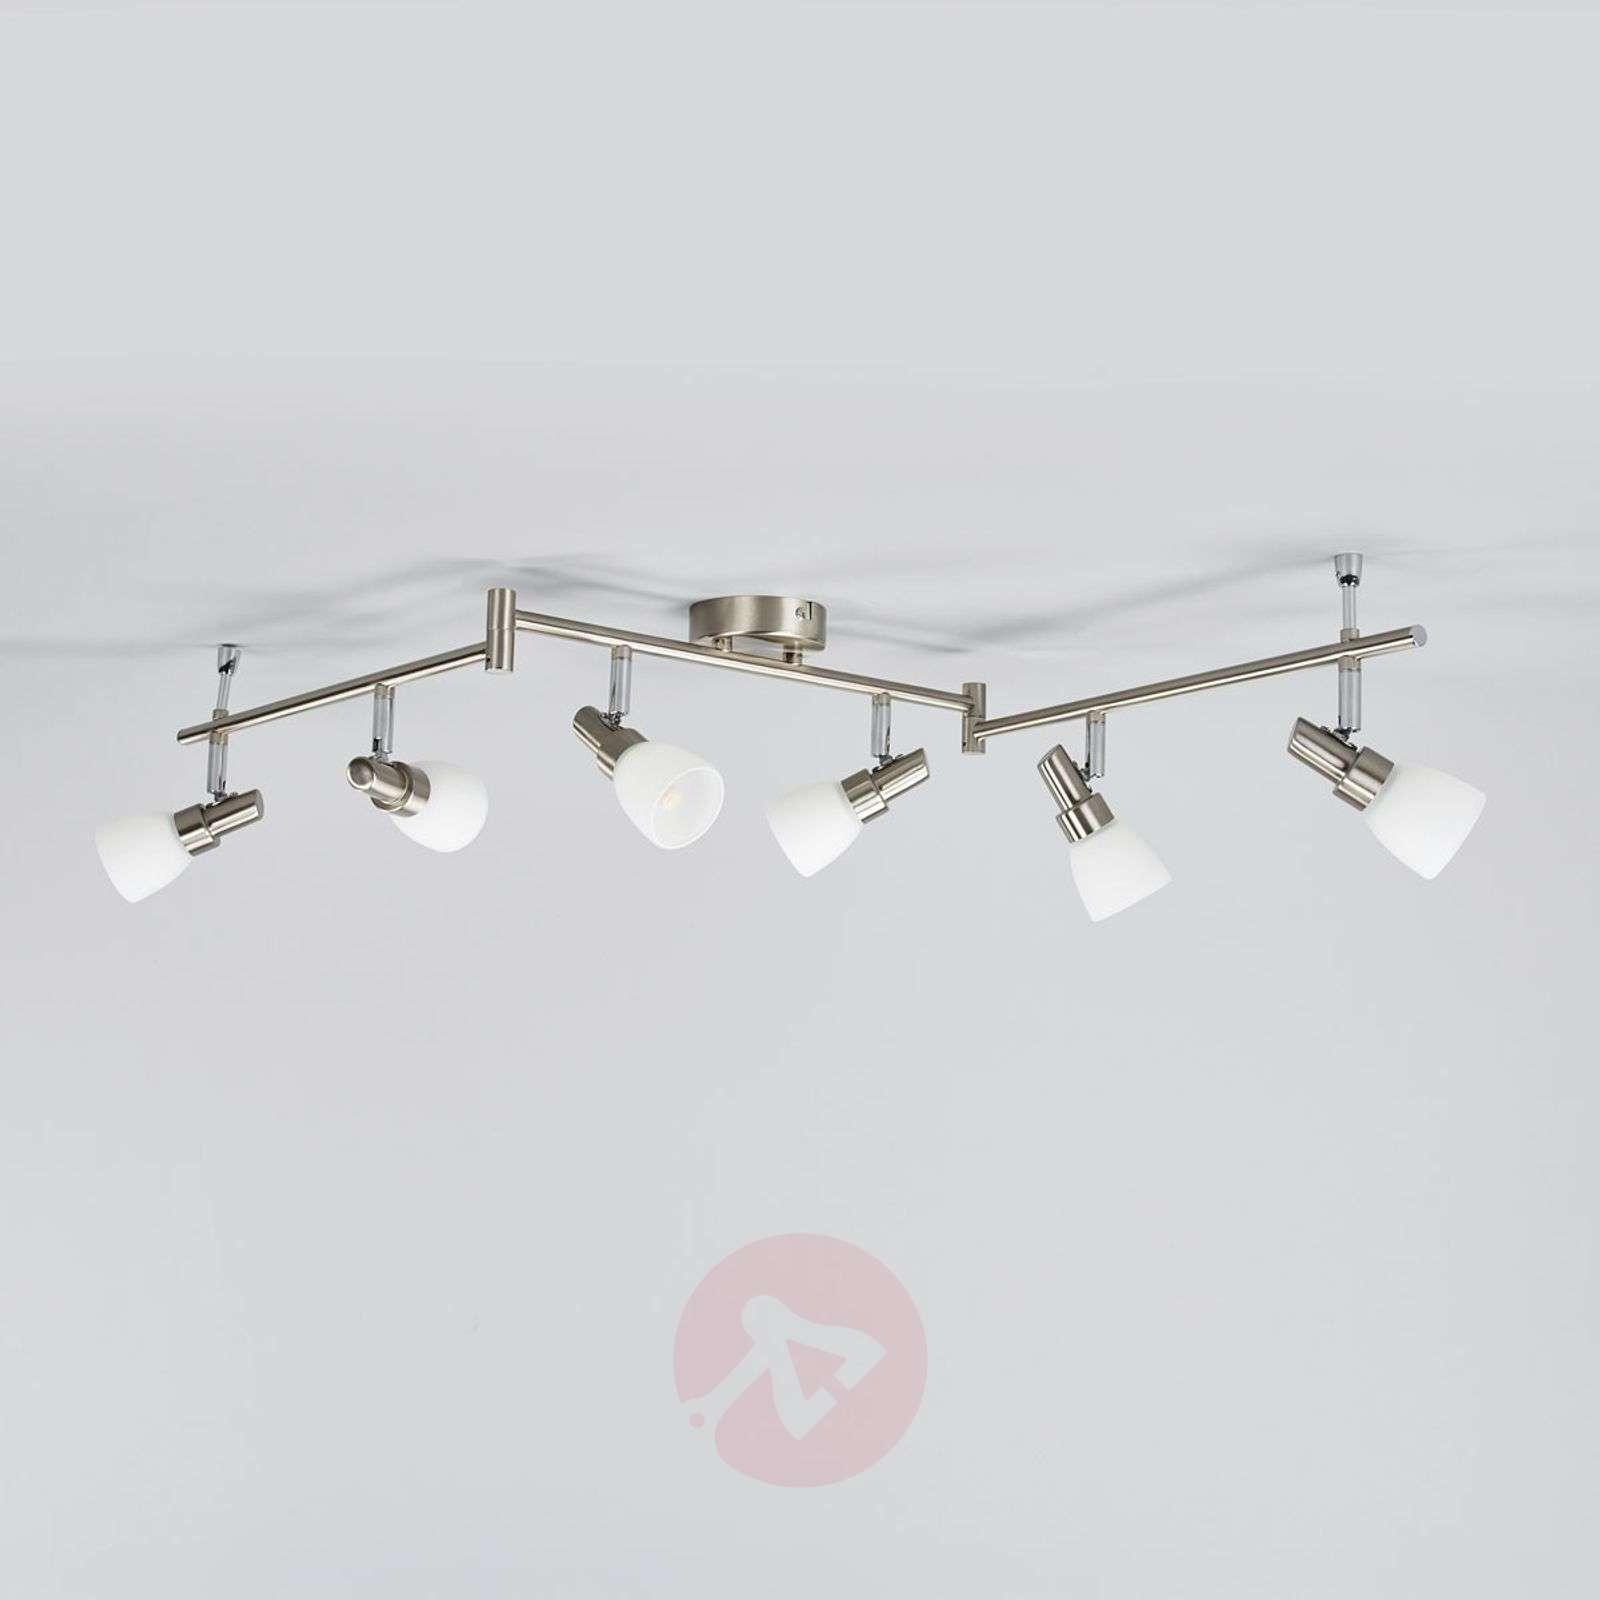 Bright Led Kitchen Light Vila G9 Dimmable 9954028 02